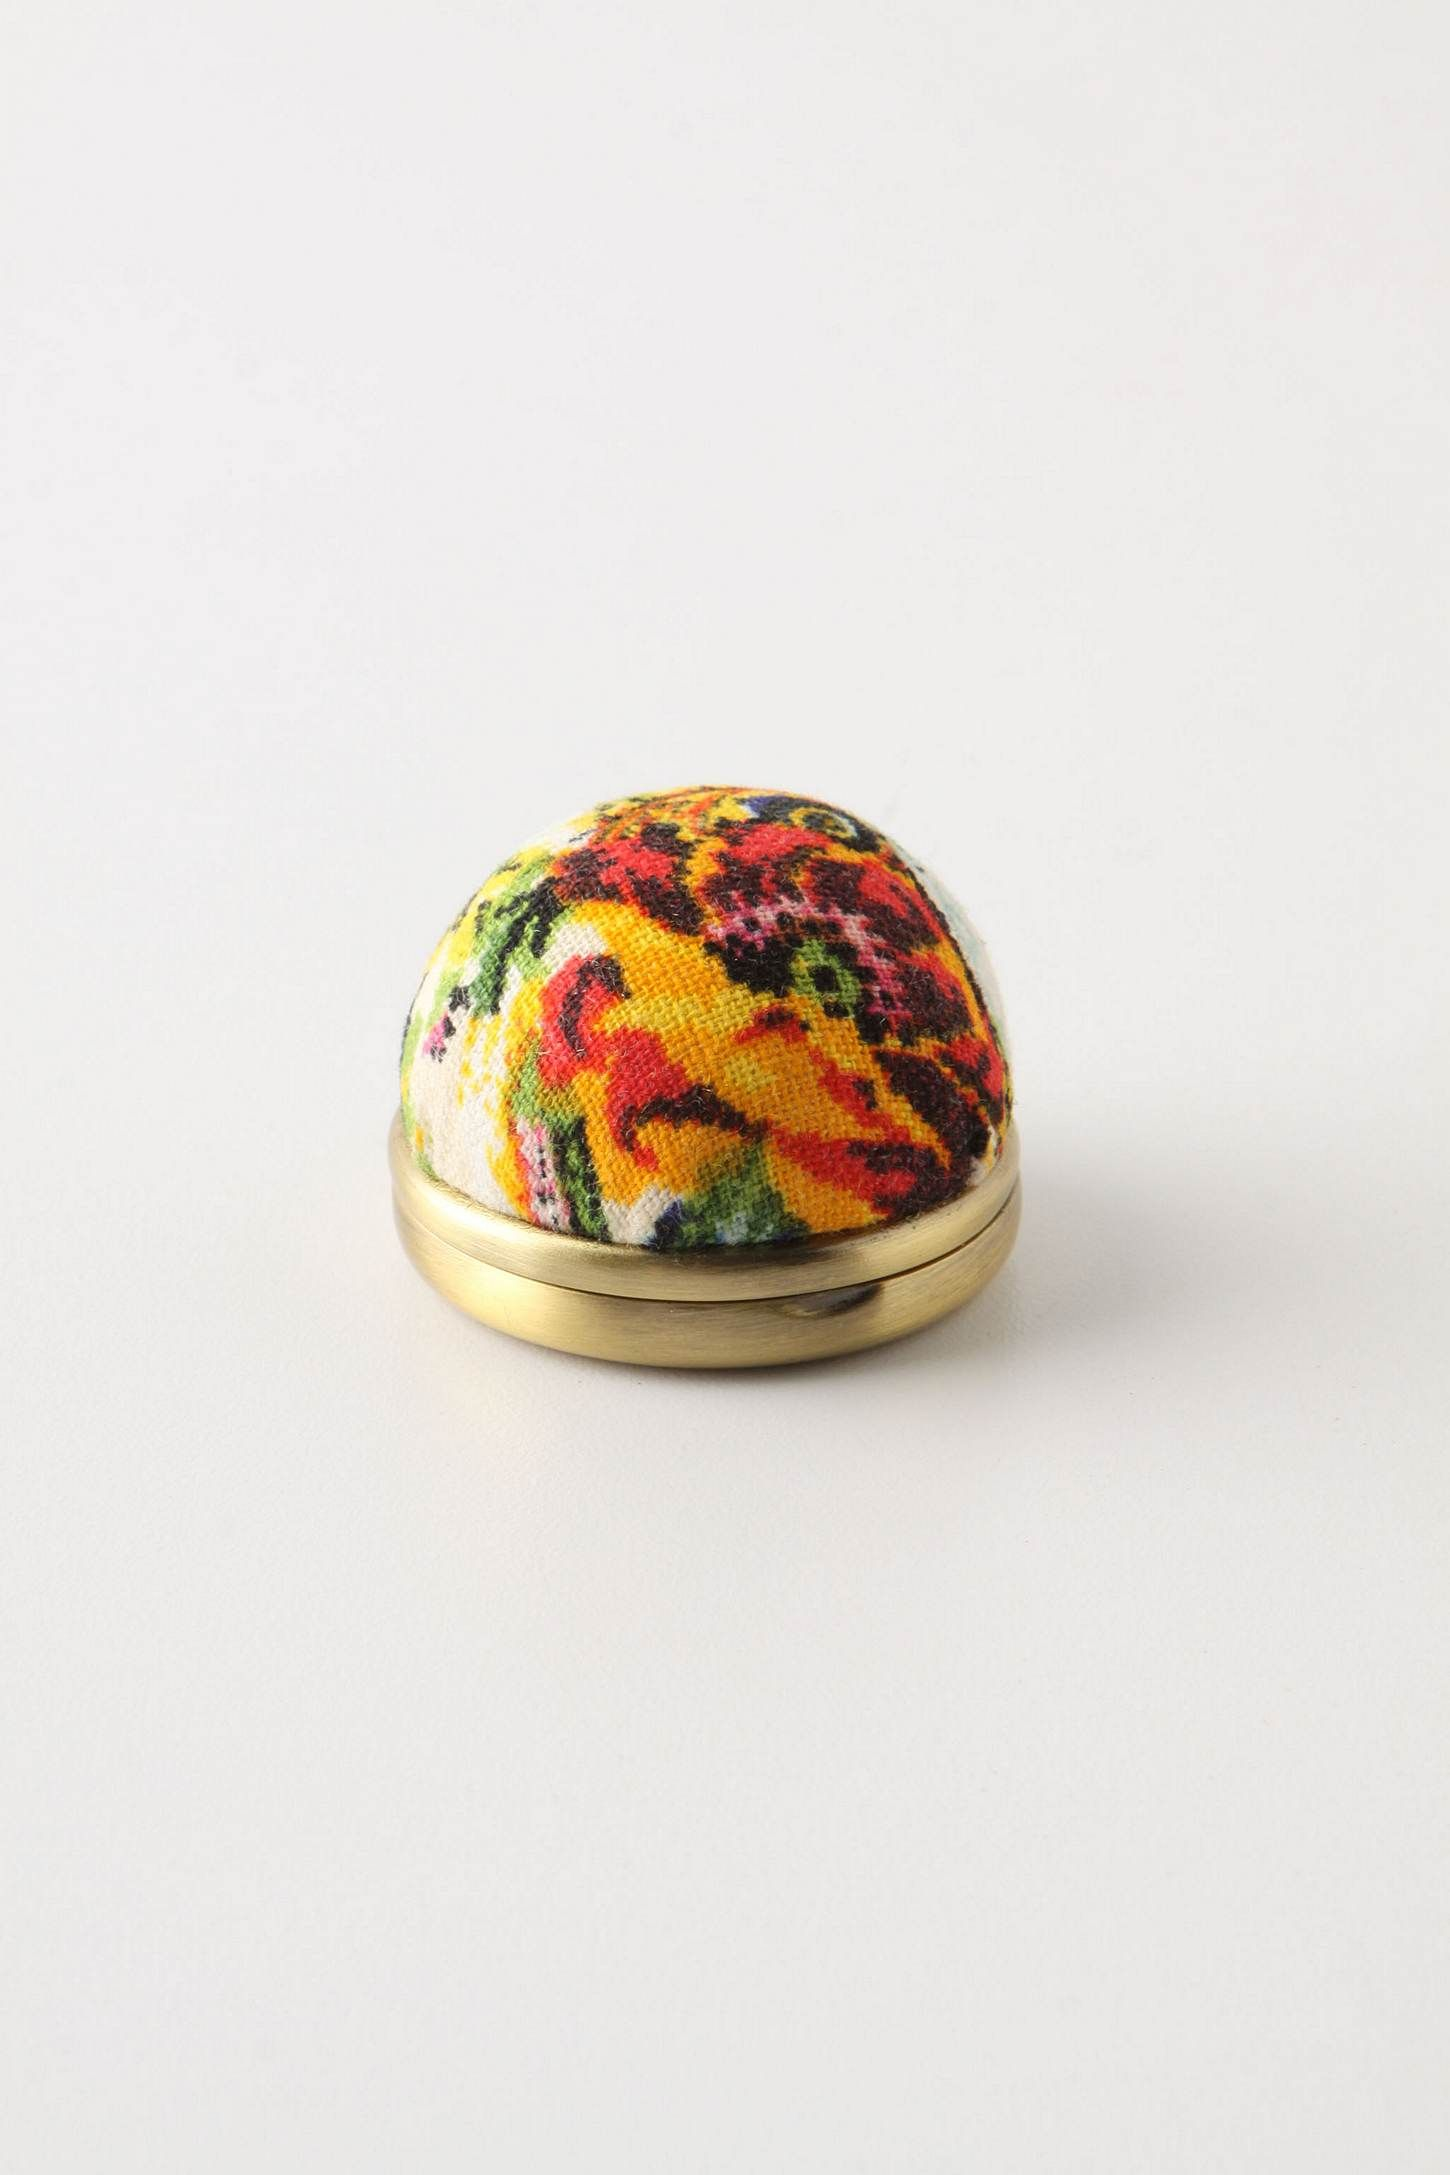 Anthropologie Happ & Stahns Solid Perfume